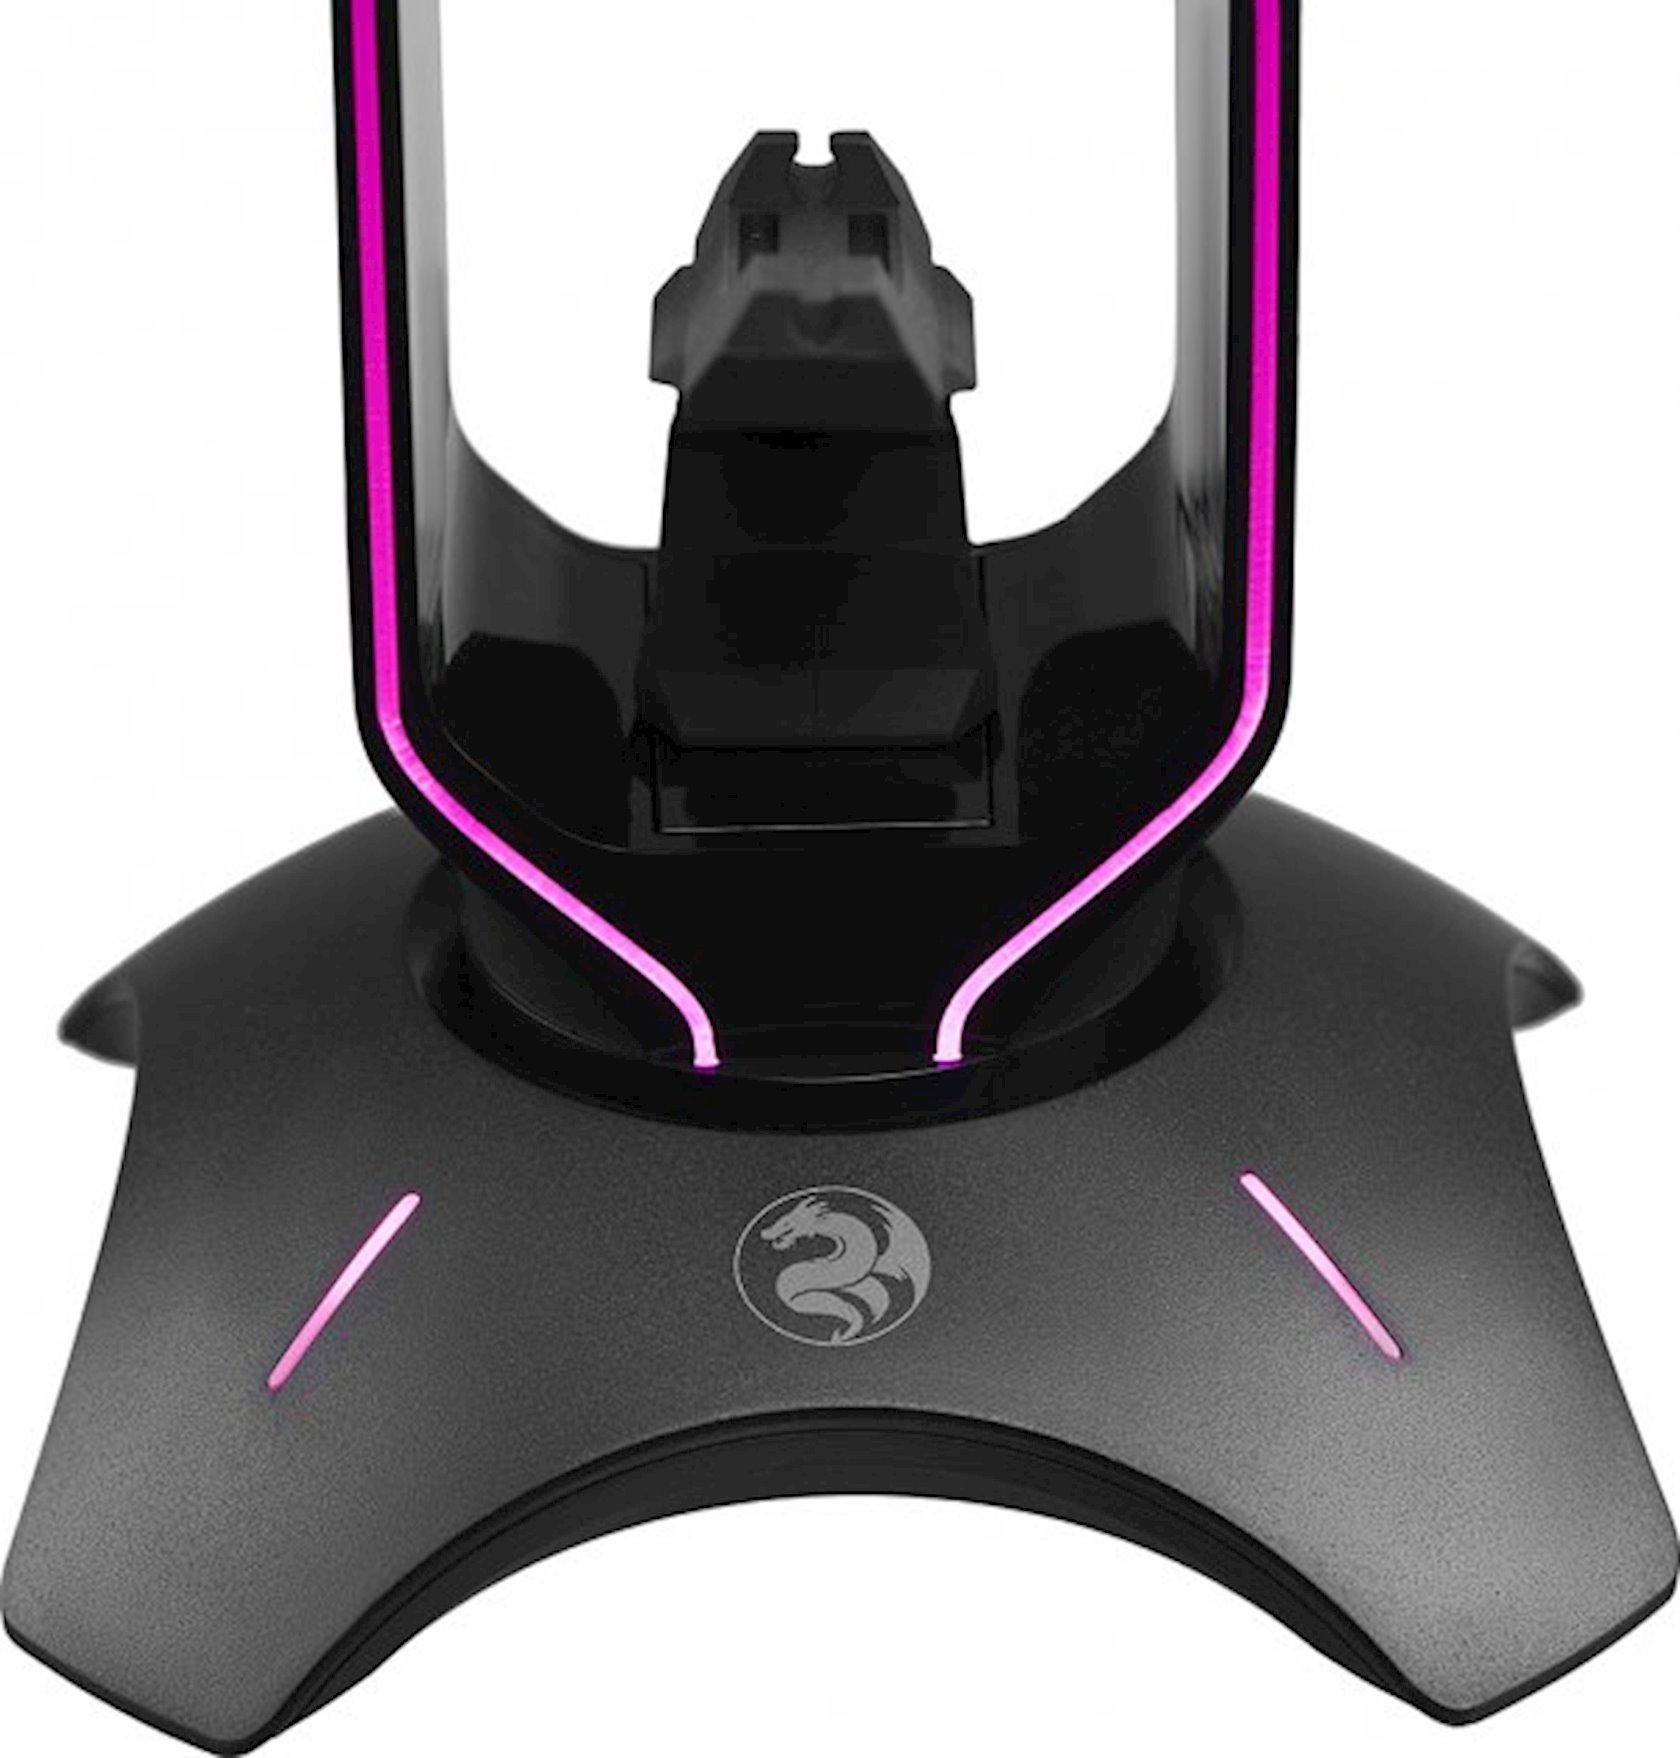 Qarnitur üçün altlıq 3-ü 1-də 2E Gaming Headset Stand RGB USB Black (2E-GST310UB)